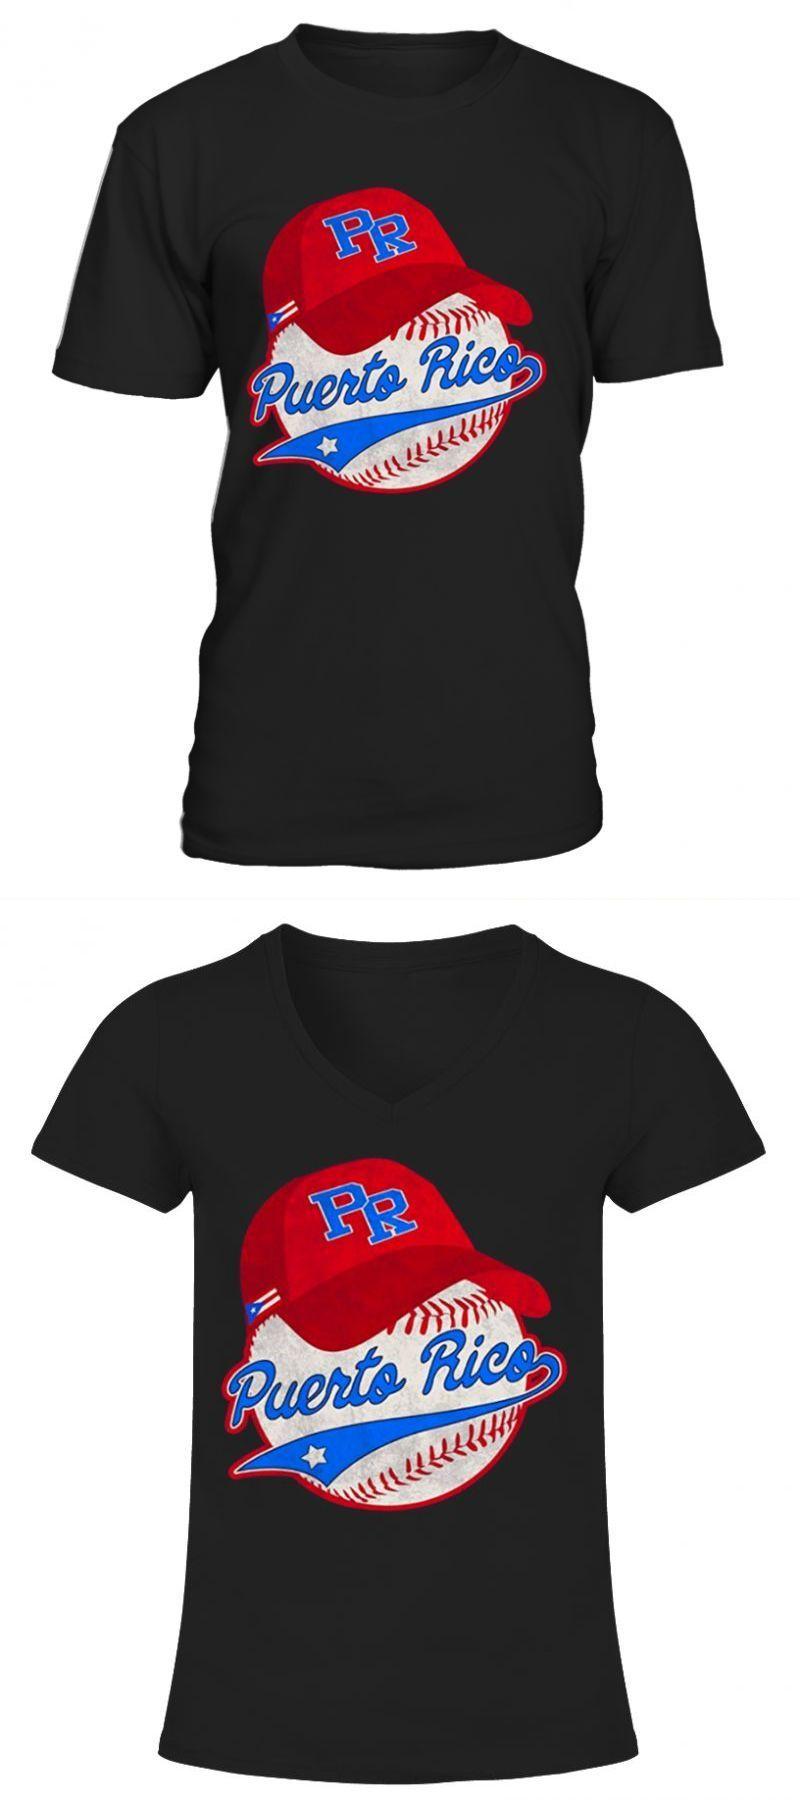 Women s hockey t shirt puerto rico baseball ball t-shirts usa hockey t shirt  jersey  women s  hockey  shirt  puerto  rico  baseball  ball  t-shirts  usa  ... e06a698b14